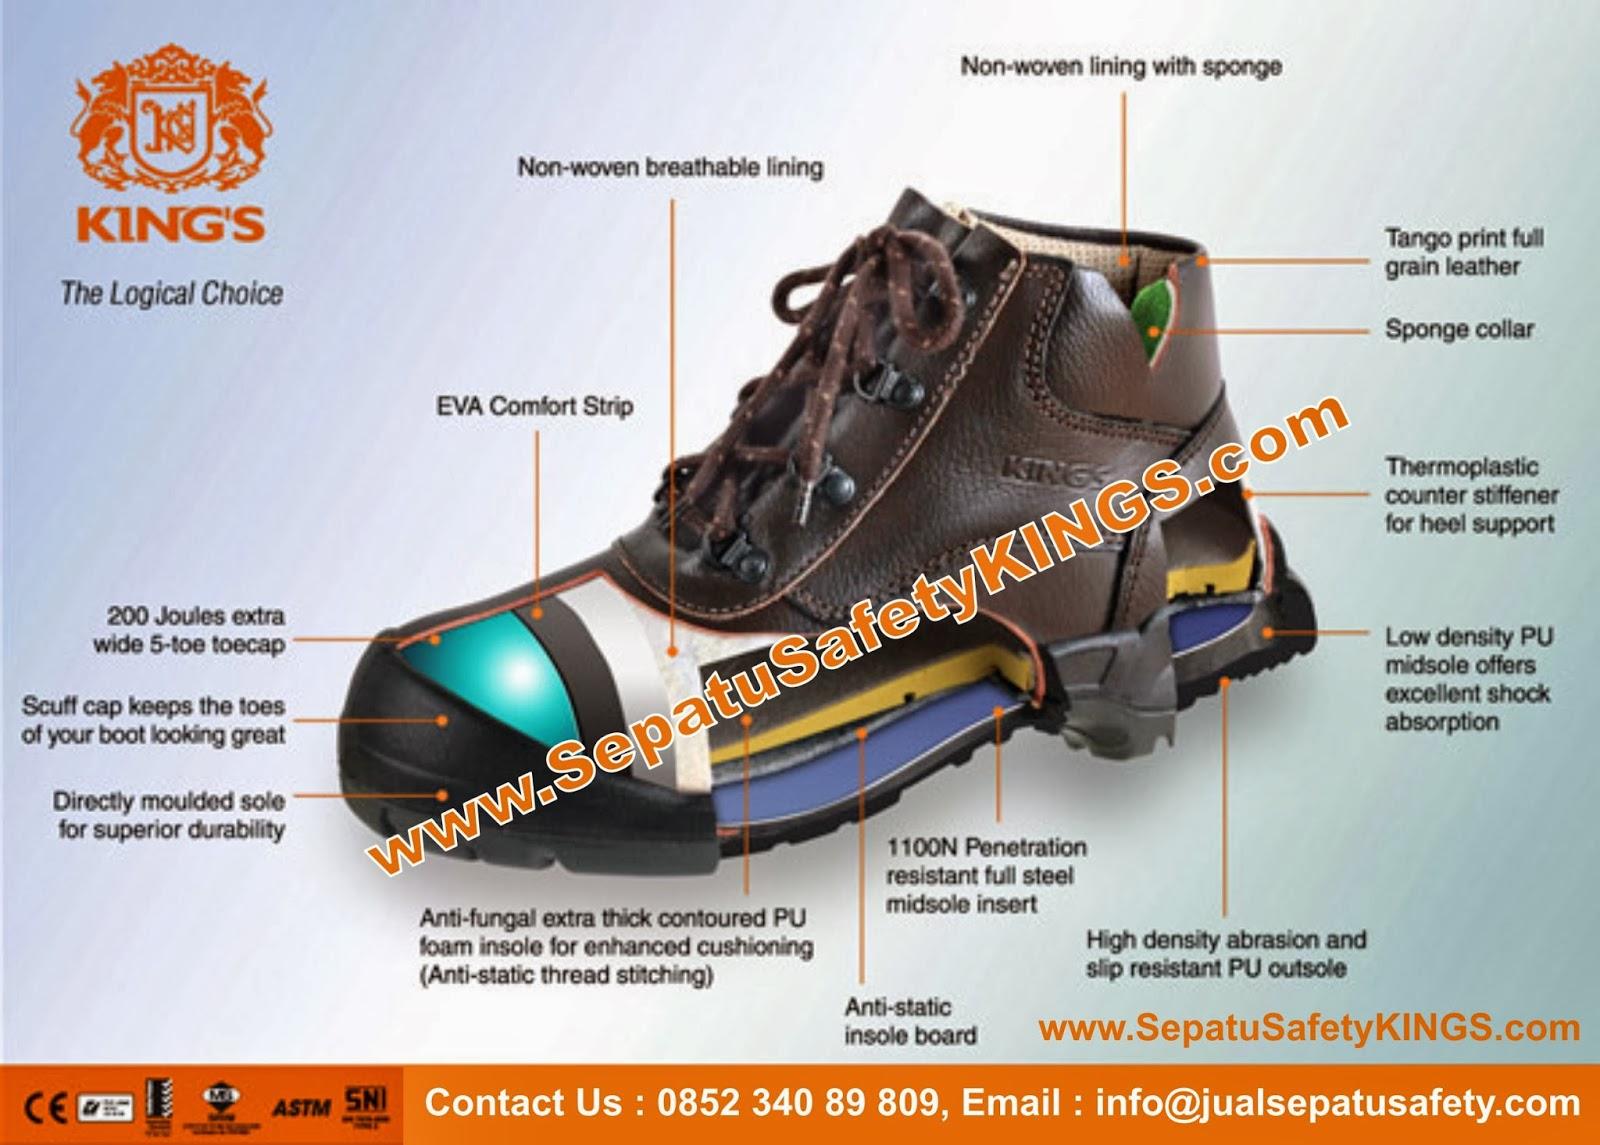 JUAL SEPATU SAFETY Shoes - Boot Harga MURAH - Toko Grosir - Holiday